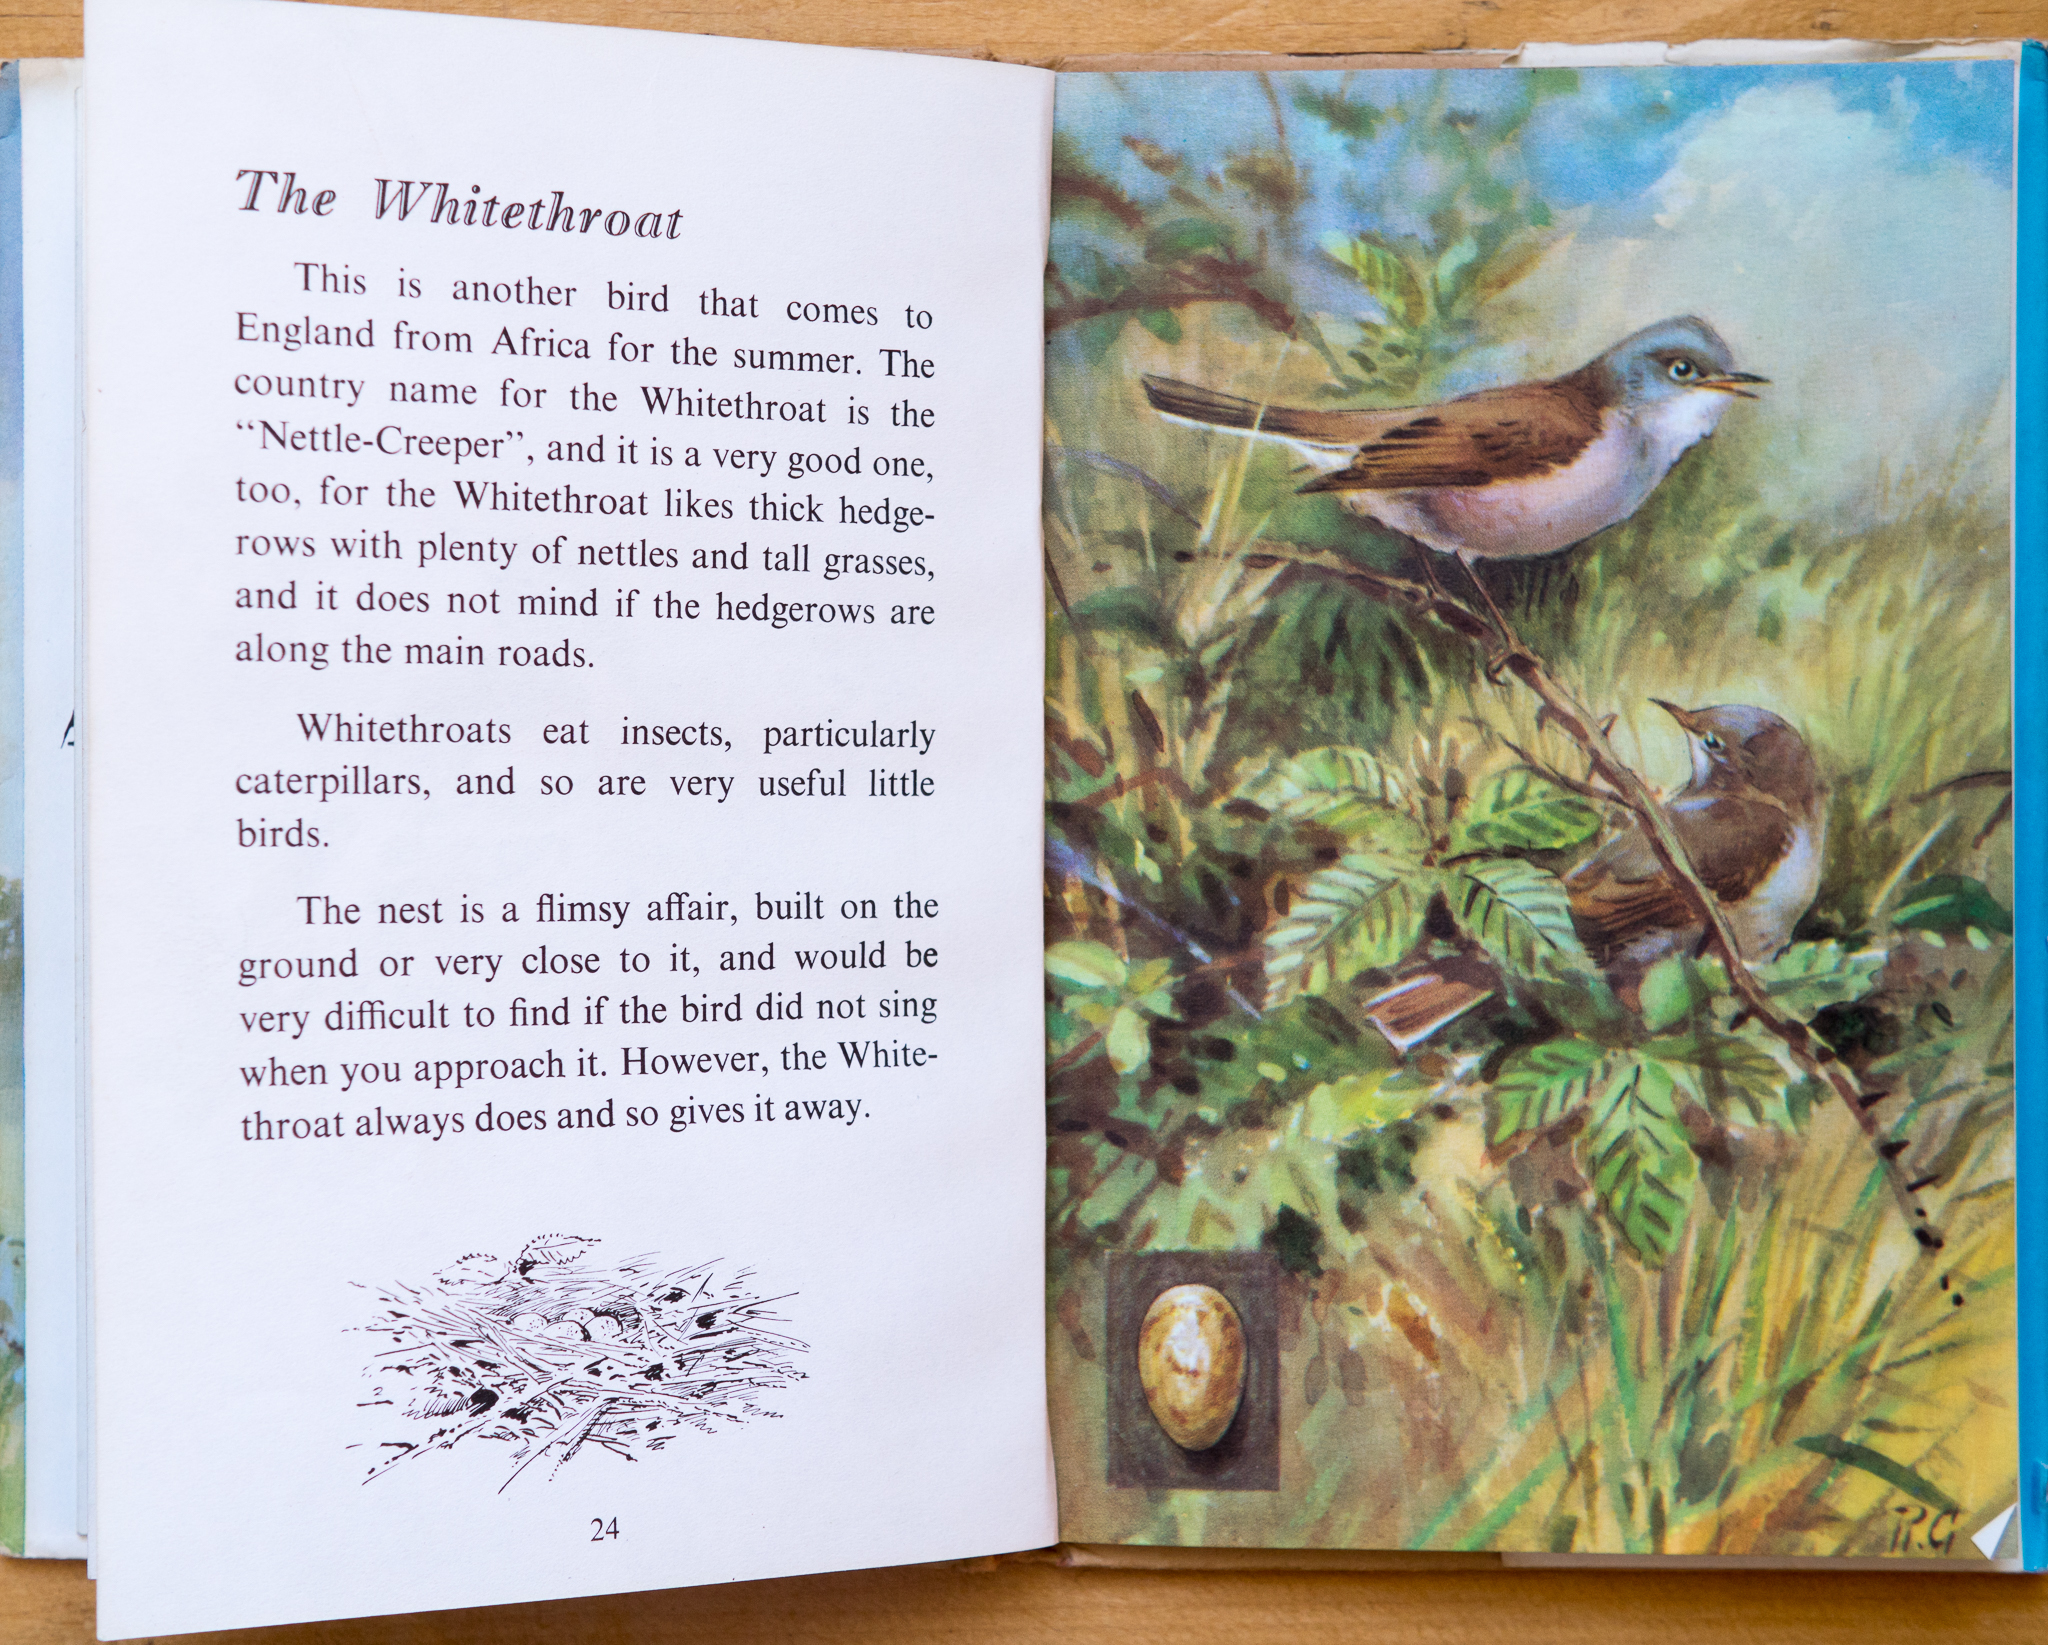 Whitethroat - Ladybird Book of British Birds